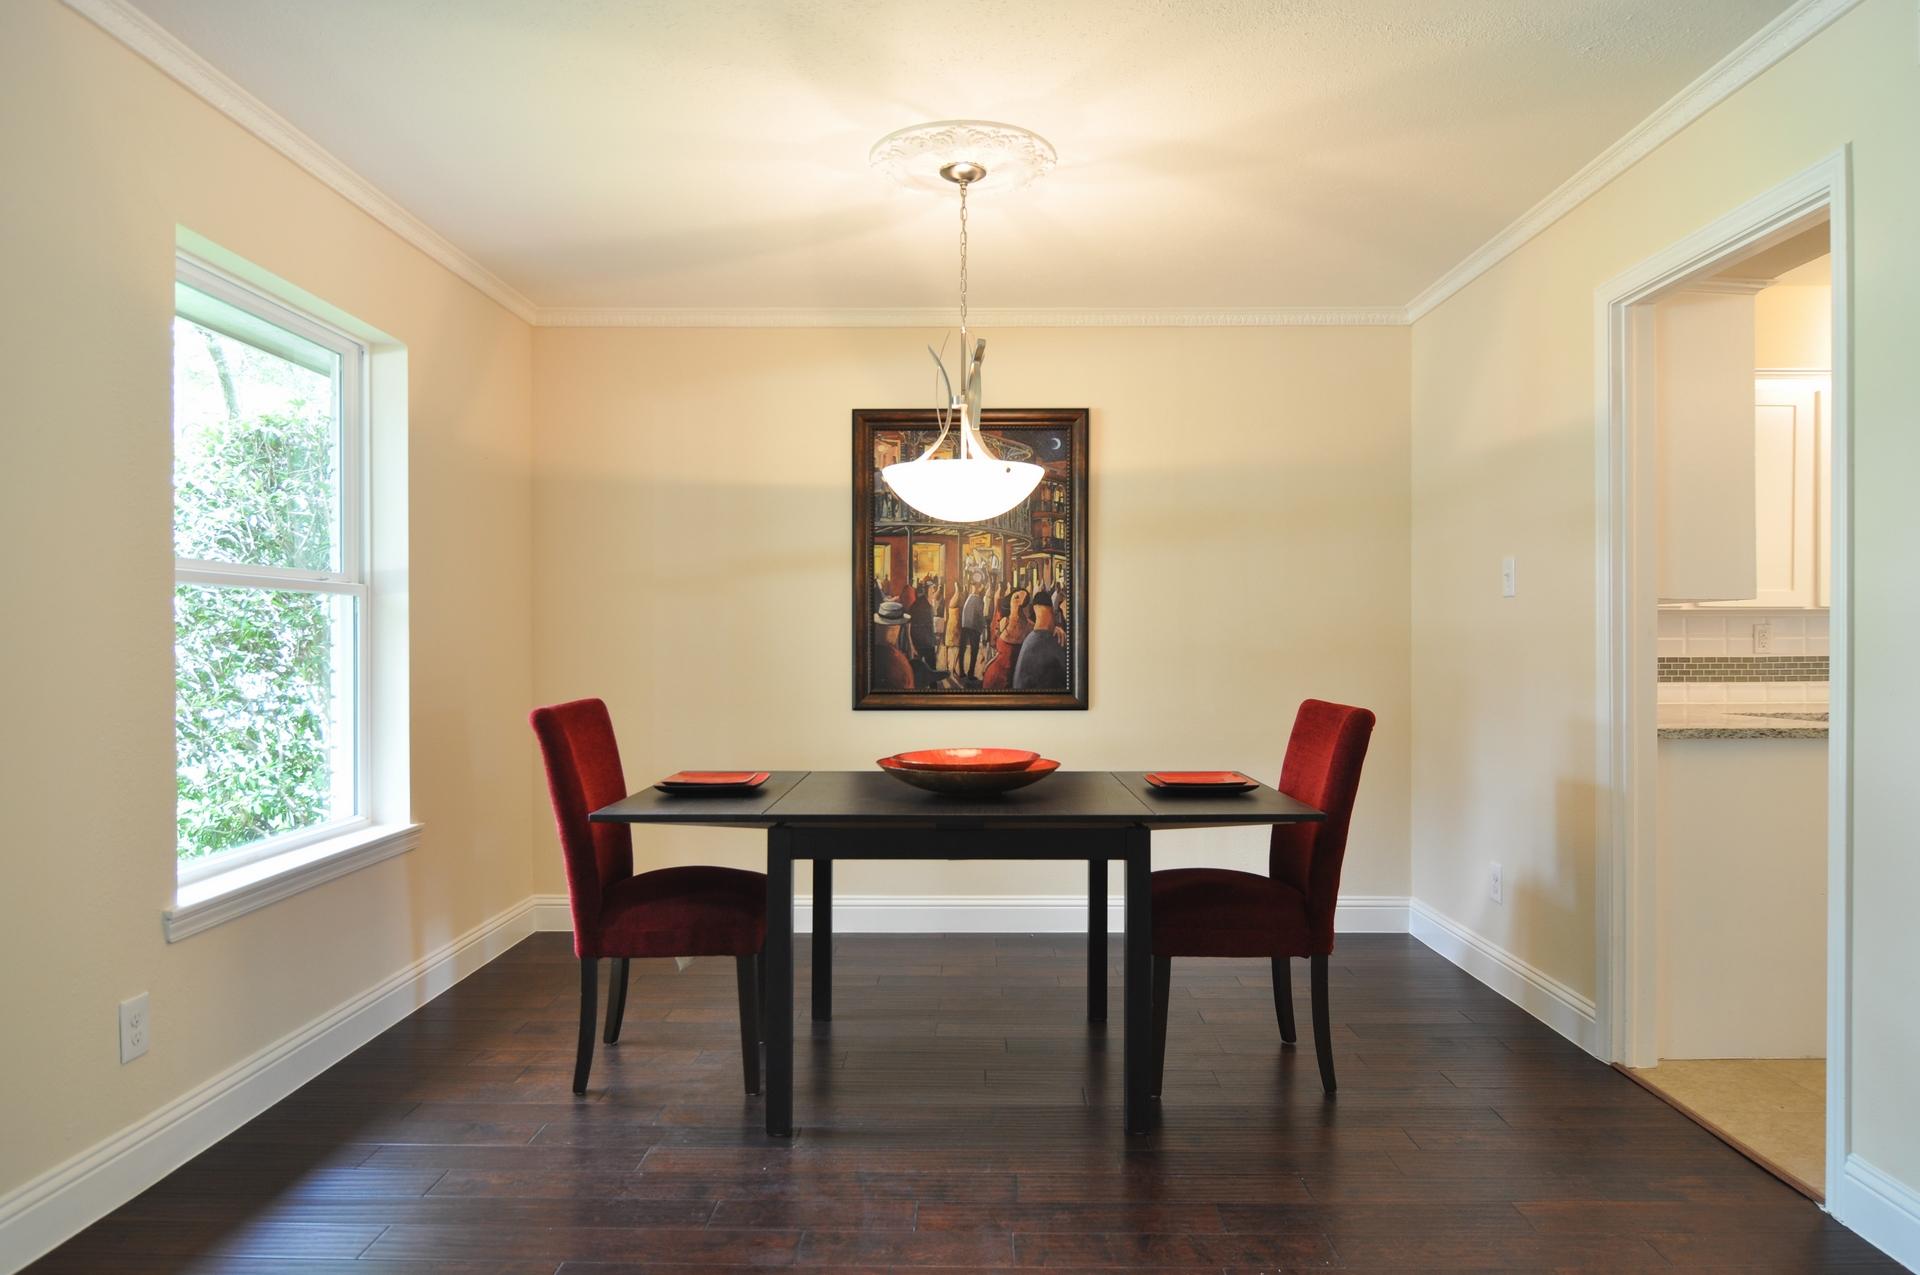 Dining Room 3133 Chapel Downs Dr Dallas TX 75229 Robert Jory.jpg